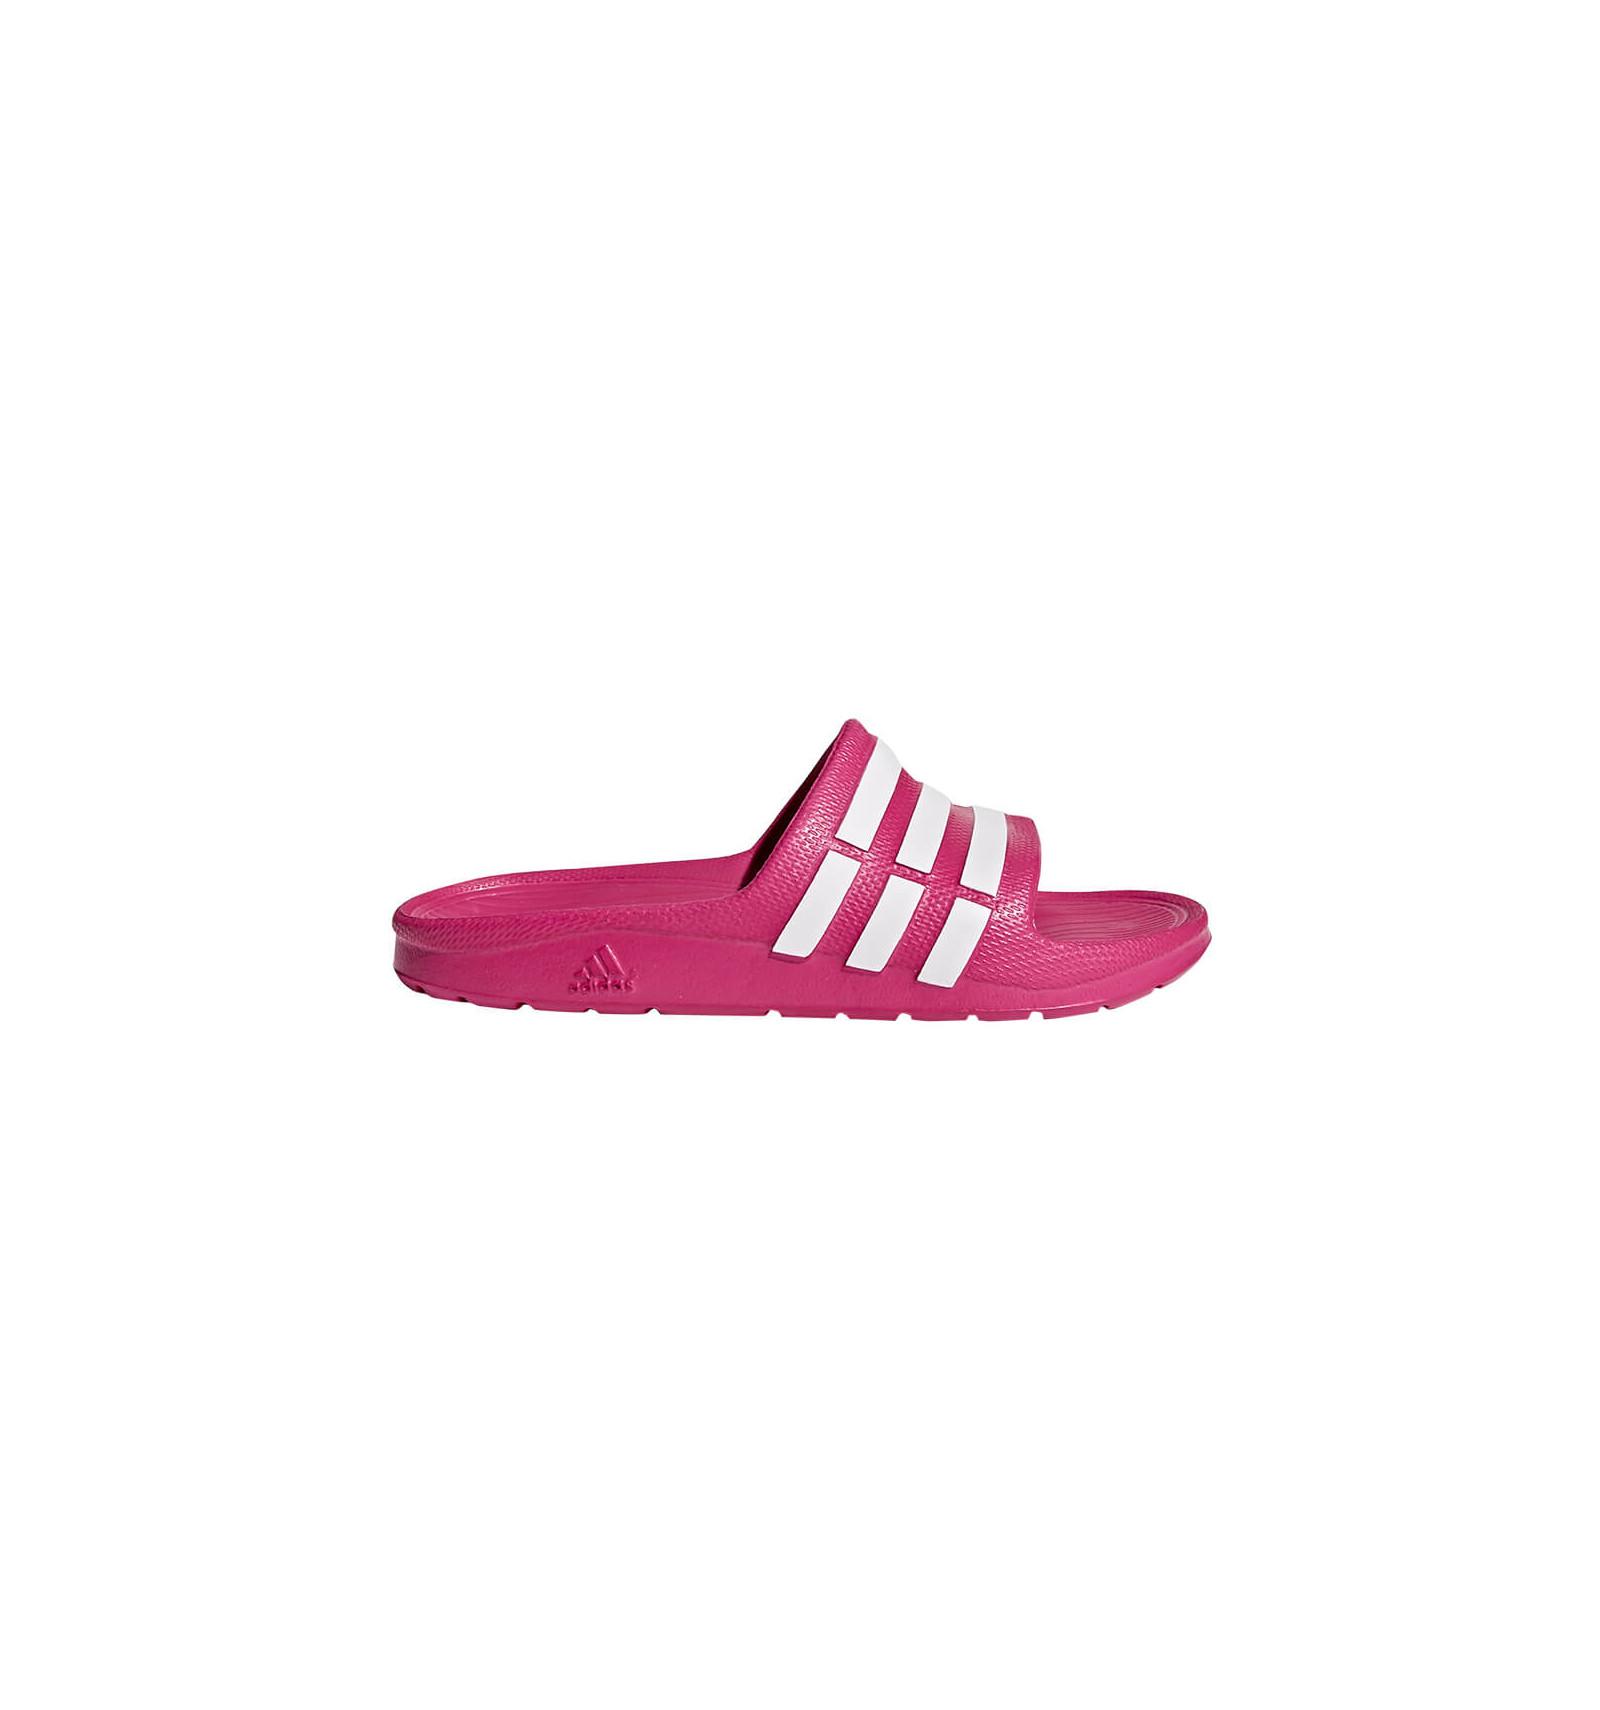 4fc3953df Adidas - Chanclas para niño Duramo Slide